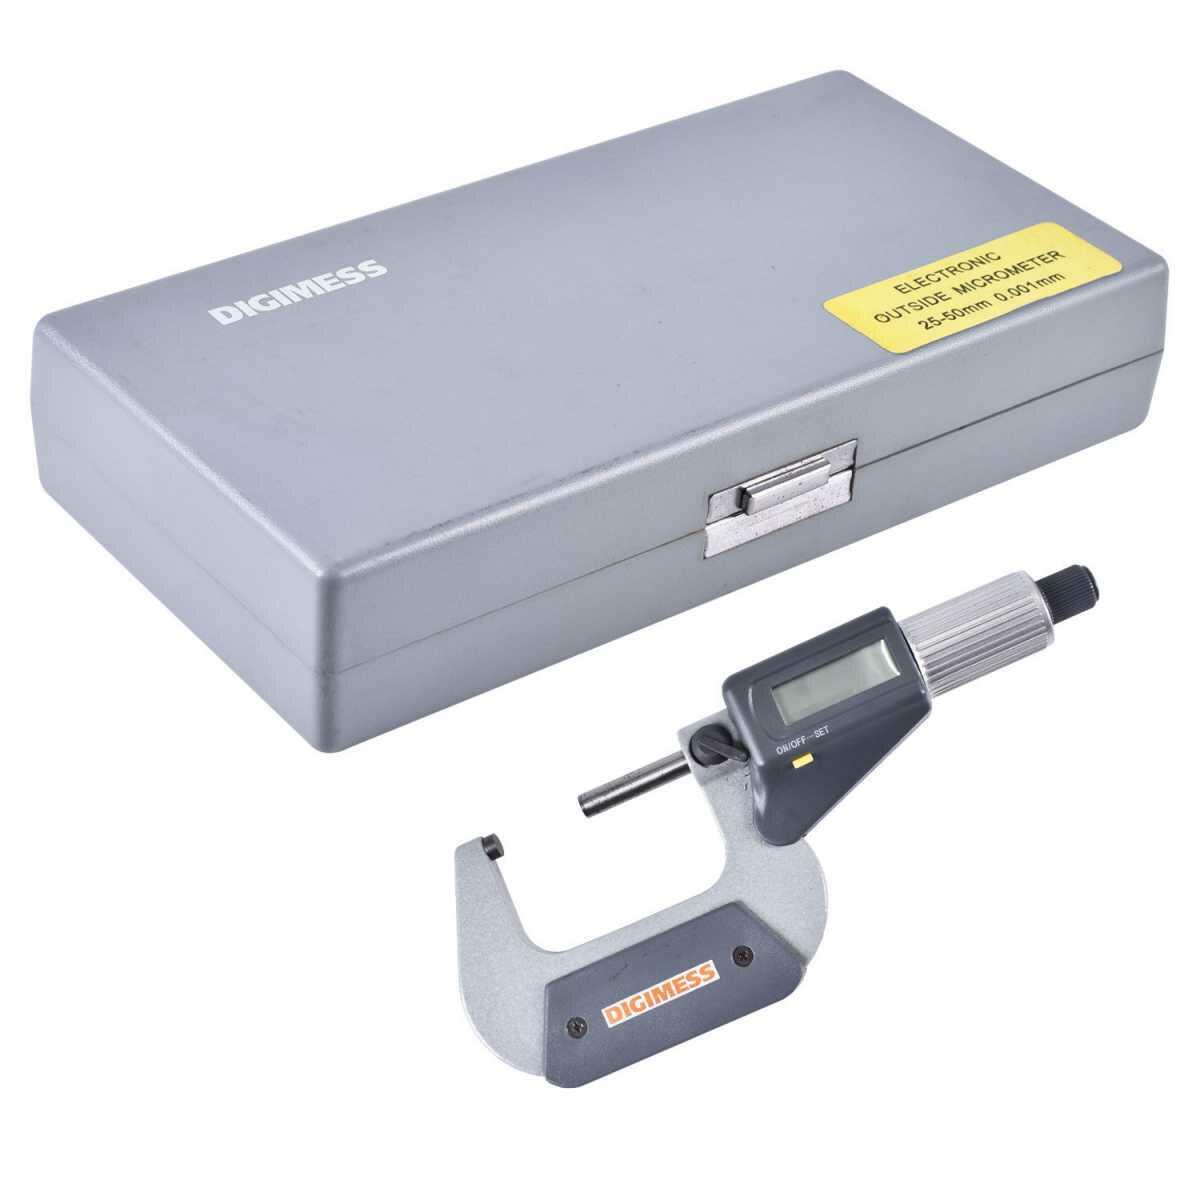 Micrômetro Externo Digital 25 – 50 MM da Digimess